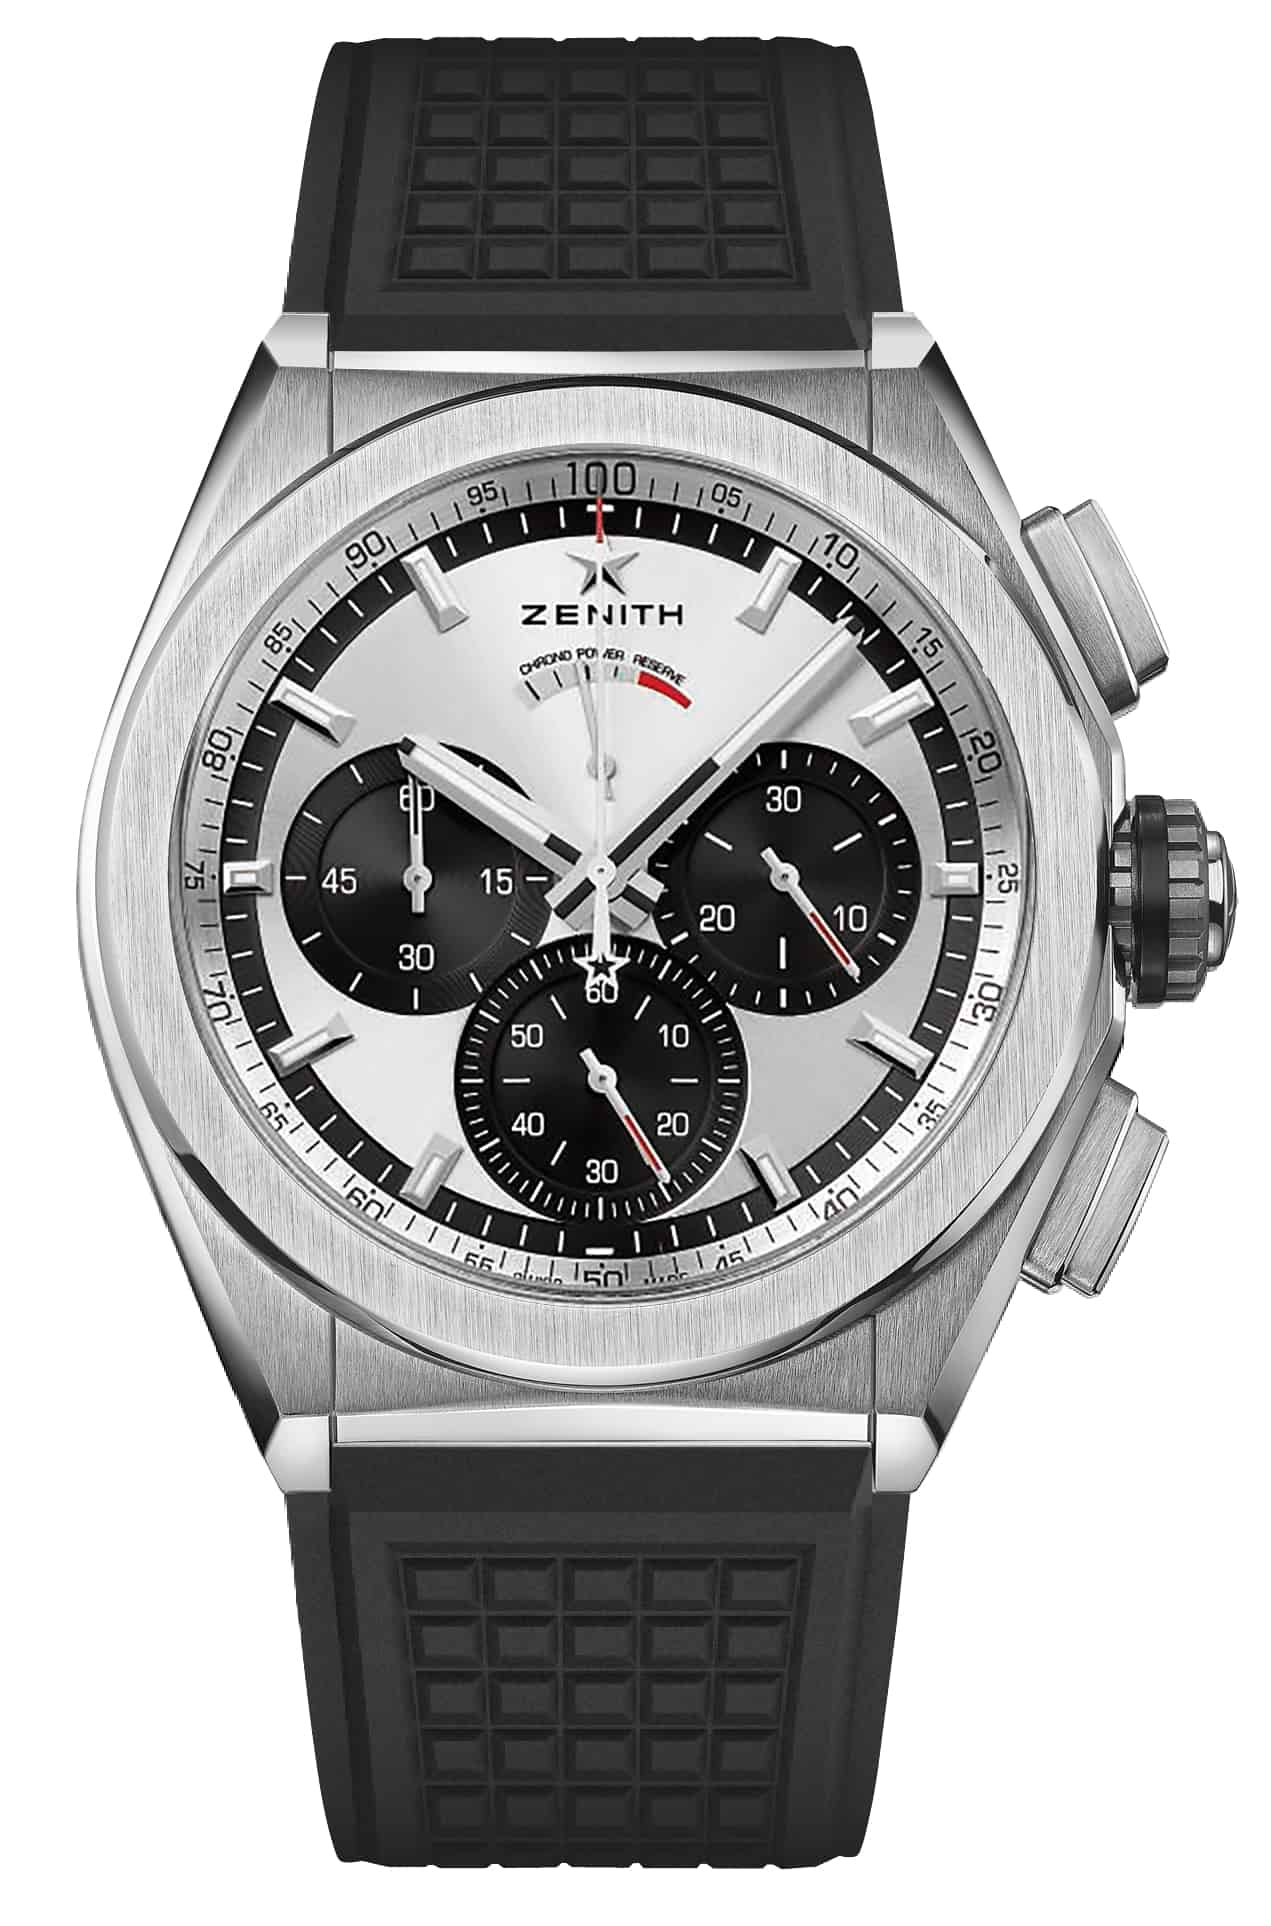 Zenith Defy El Primero 21 - klassisch wie das Design auch das El Primero Chronographen-Werk